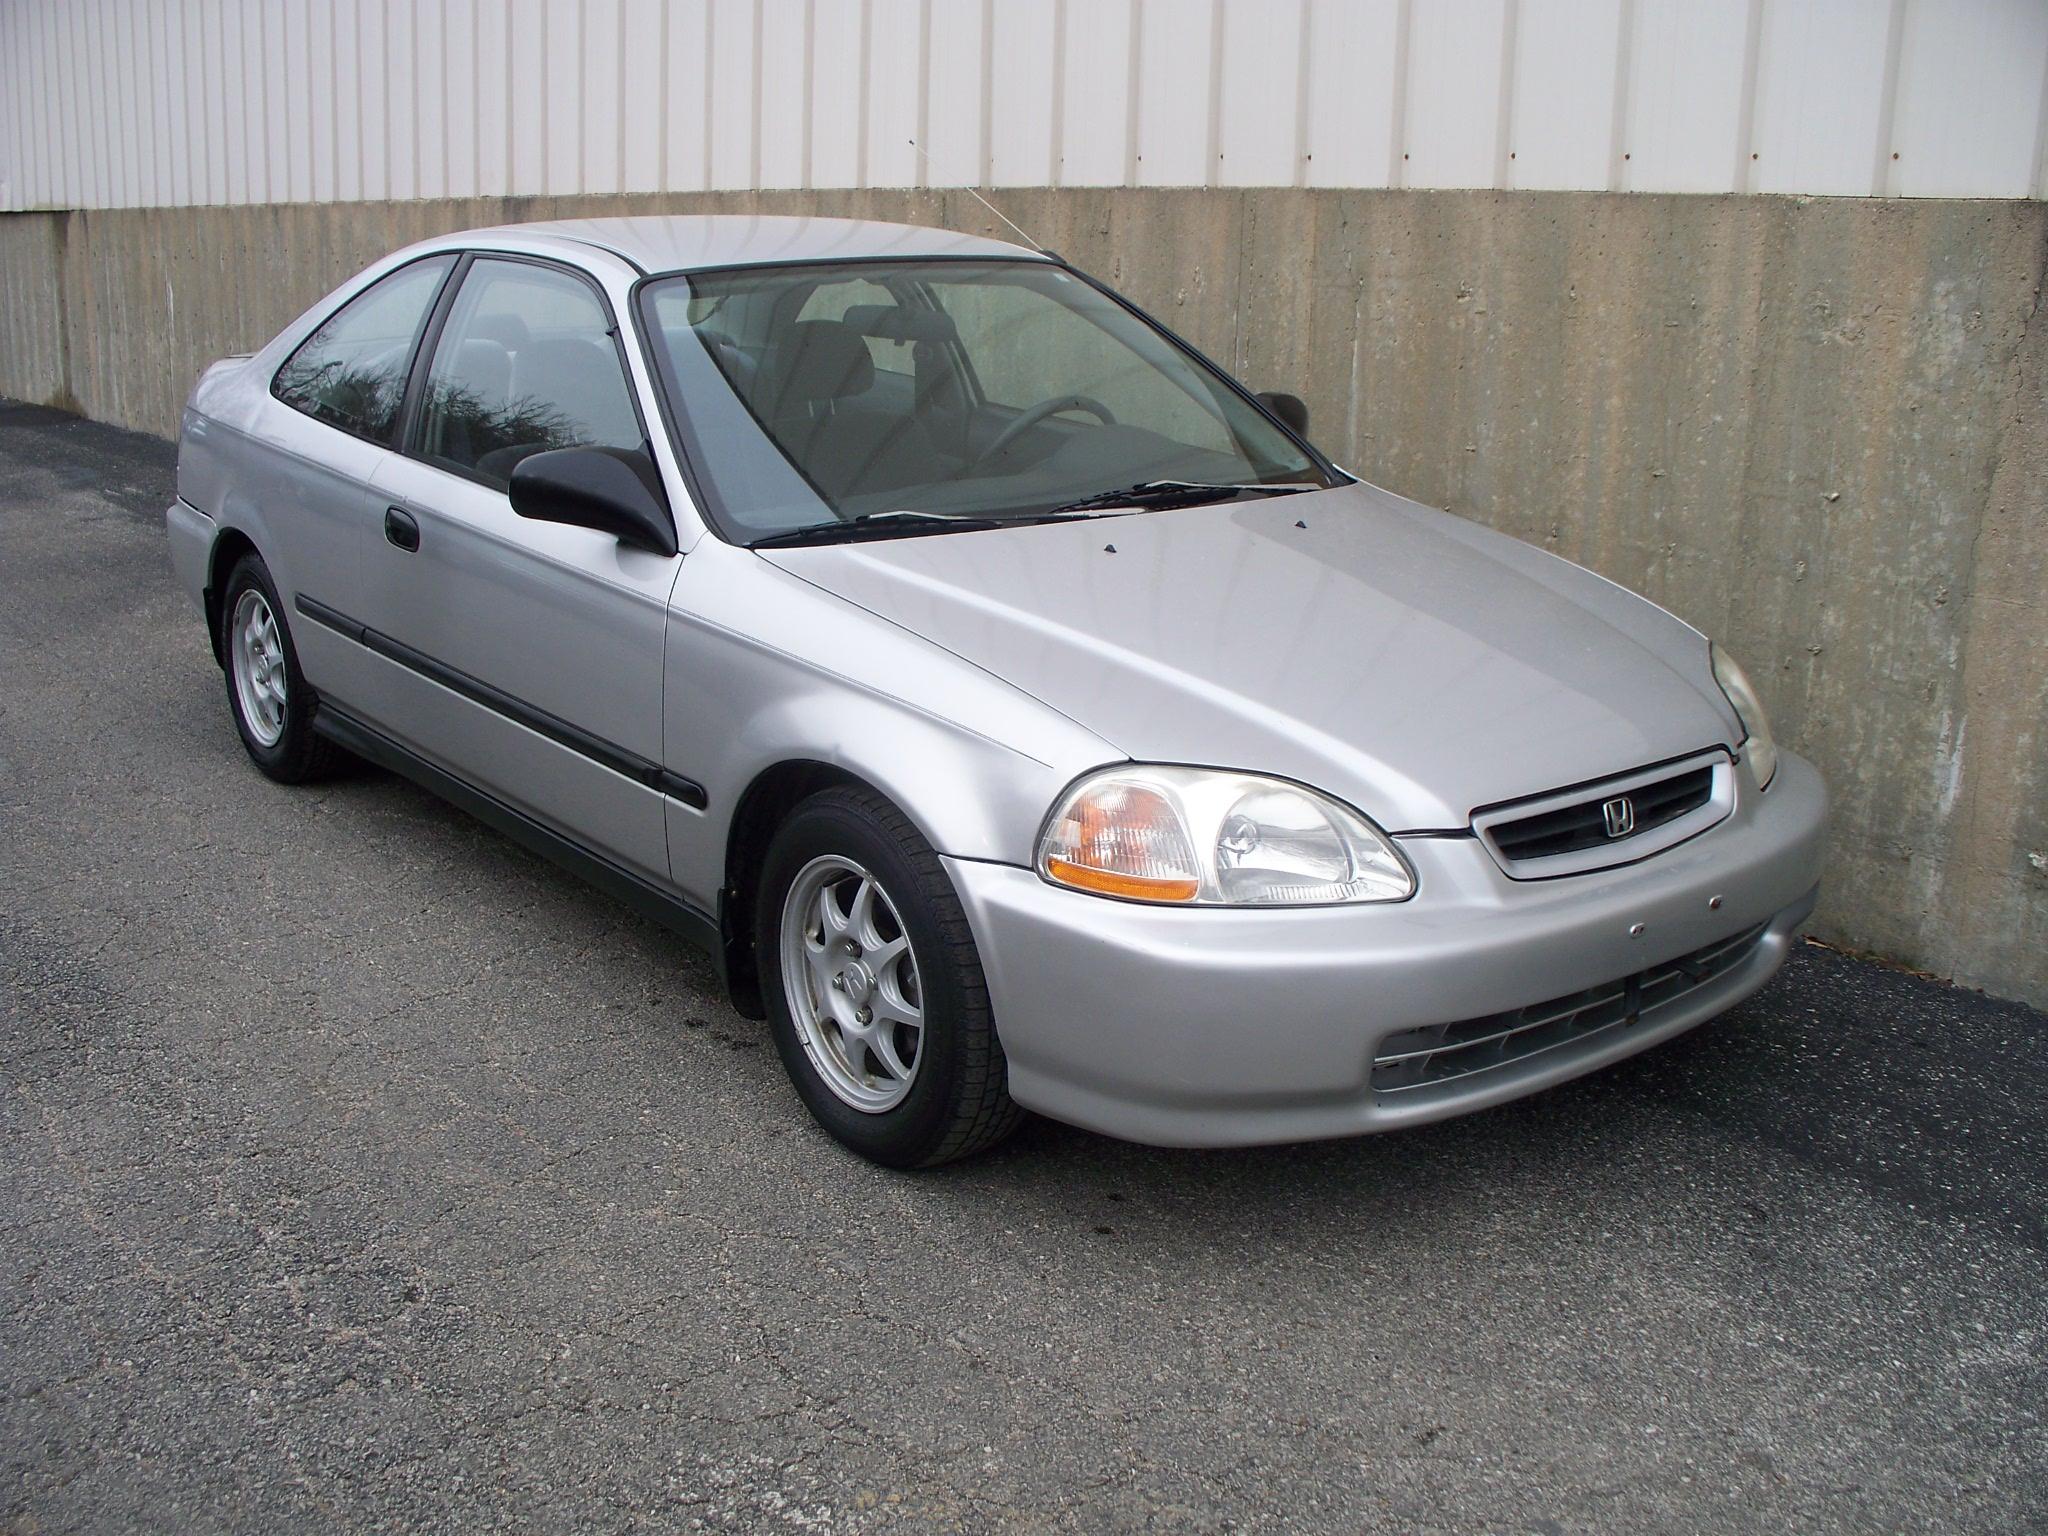 1997 Honda Civic - Partsopen